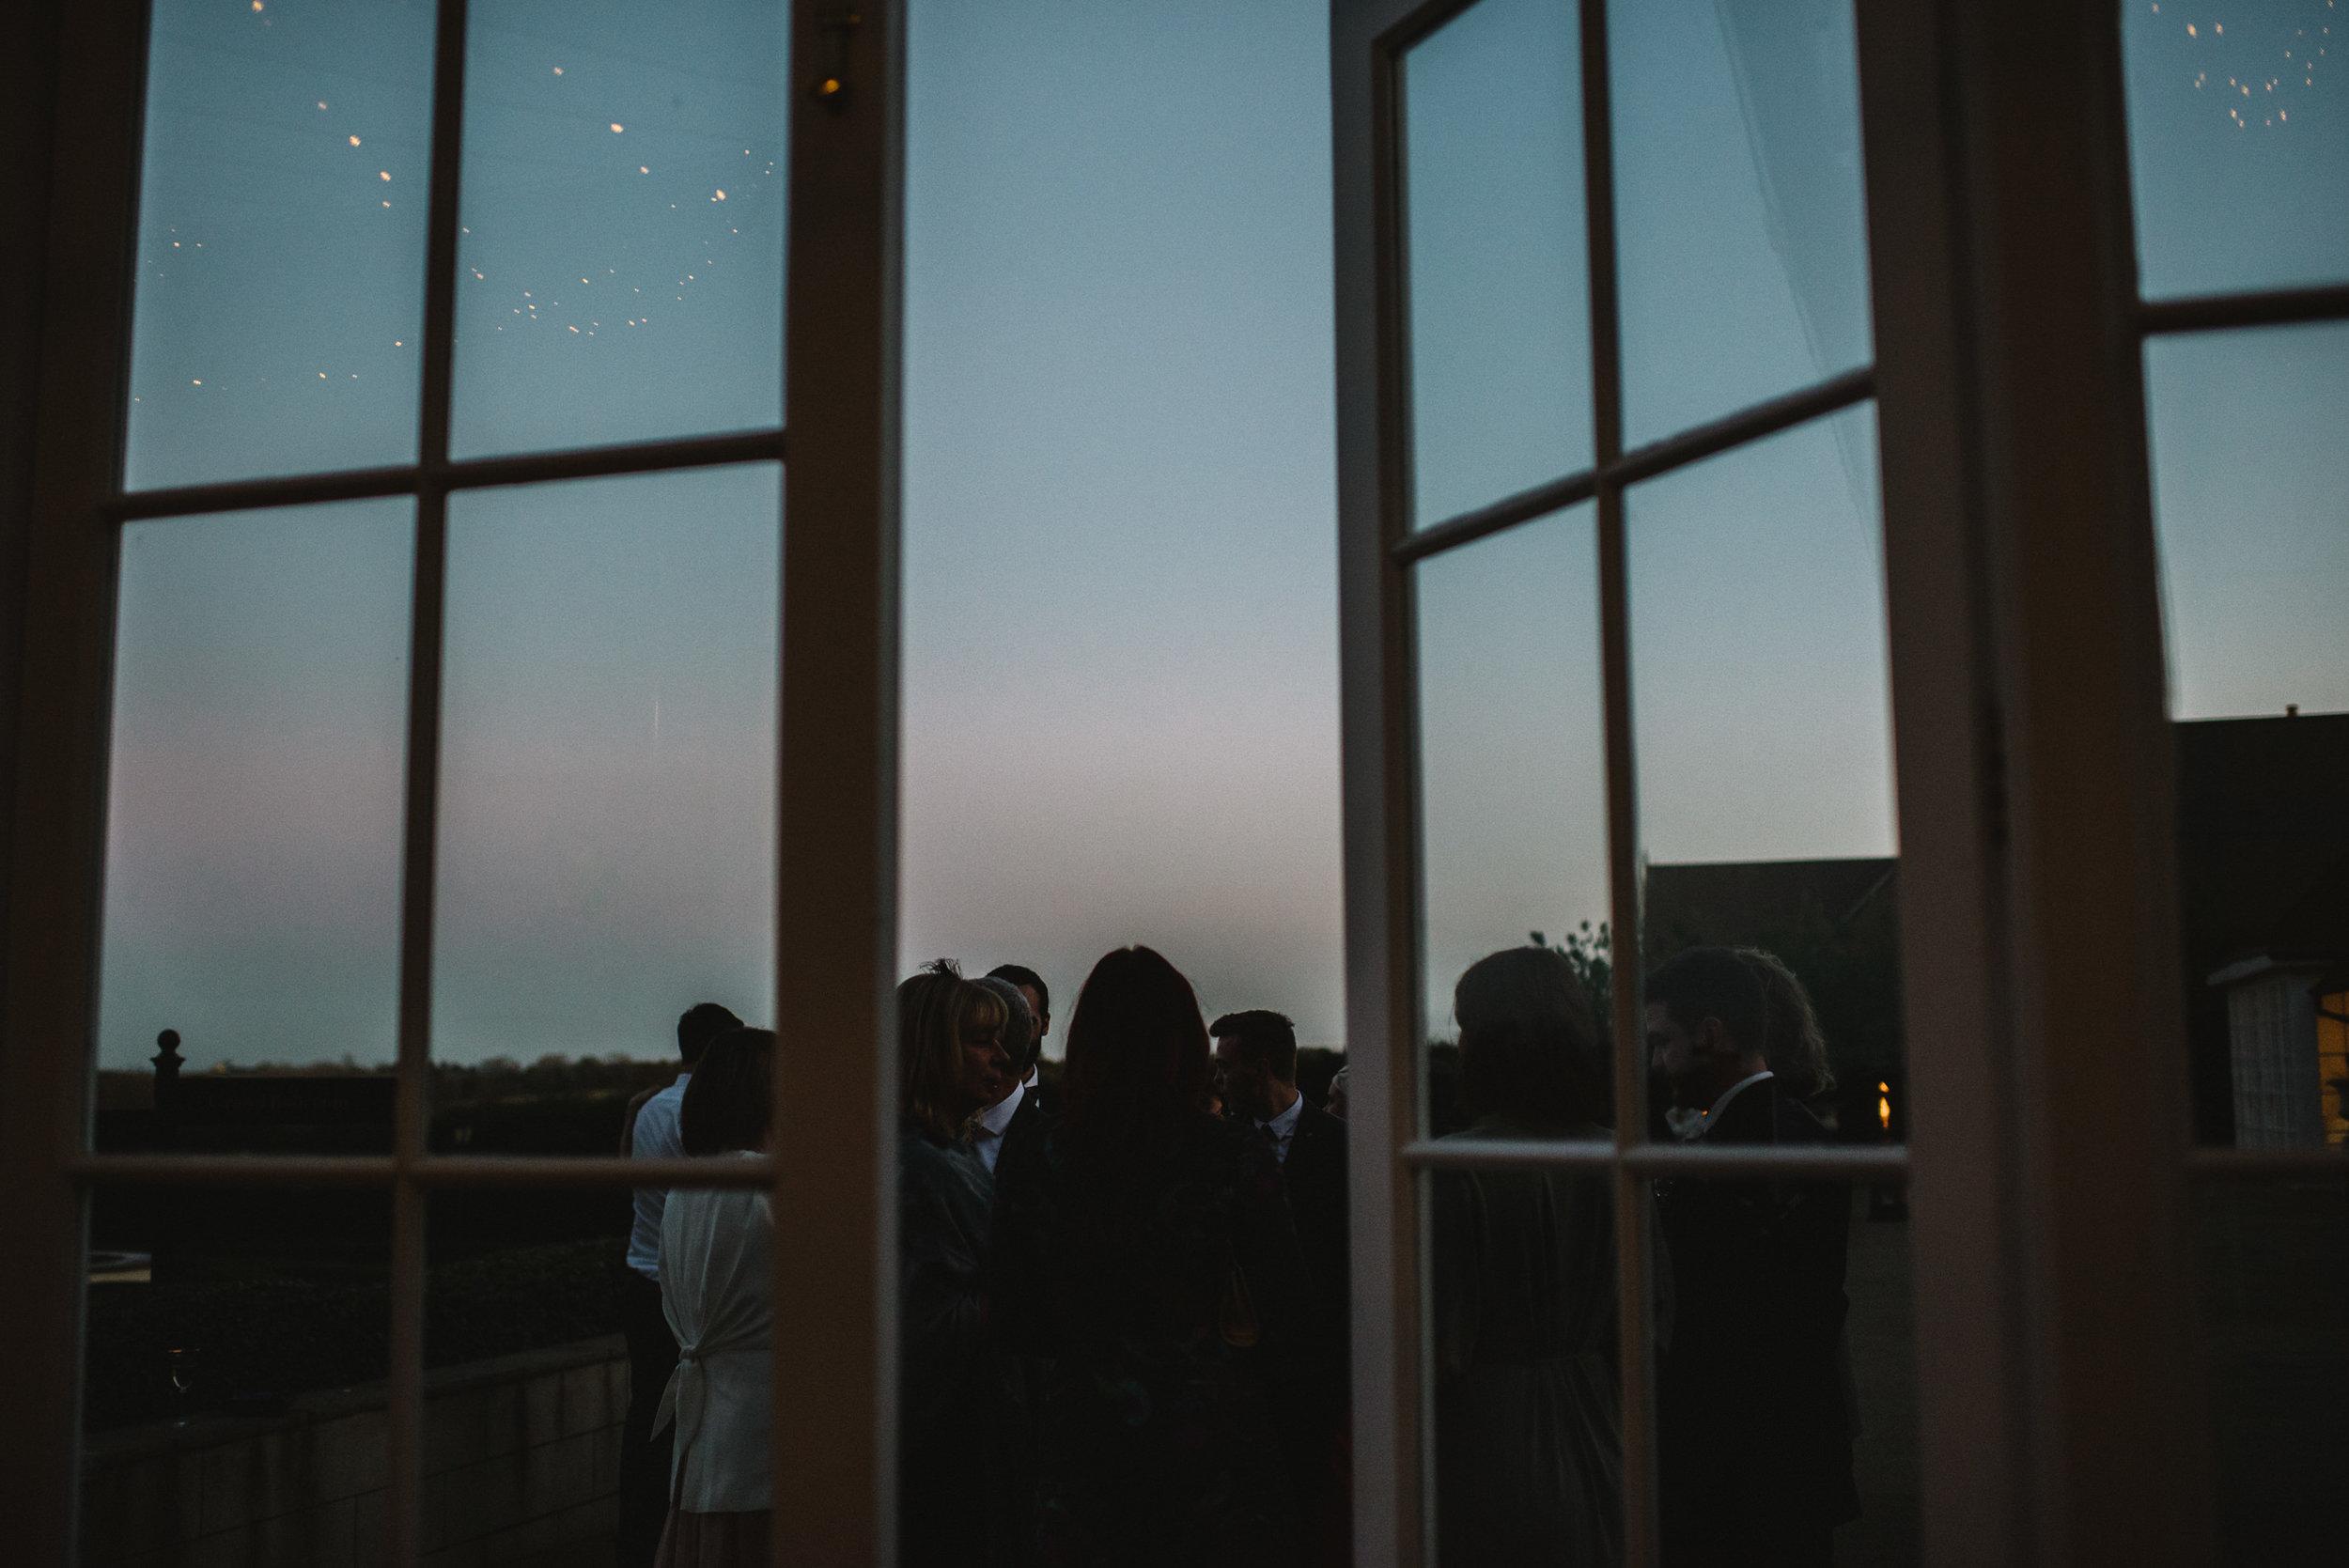 0072-LISA-DEVINE-PHOTOGRAPHY-ALTERNATIVE-WEDDING-PHOTOGRAPHY-SCOTLAND-DESTINATION-WEDDINGS-GLASGOW-WEDDINGS-COOL-WEDDINGS-STYLISH-WEDDINGS.JPG